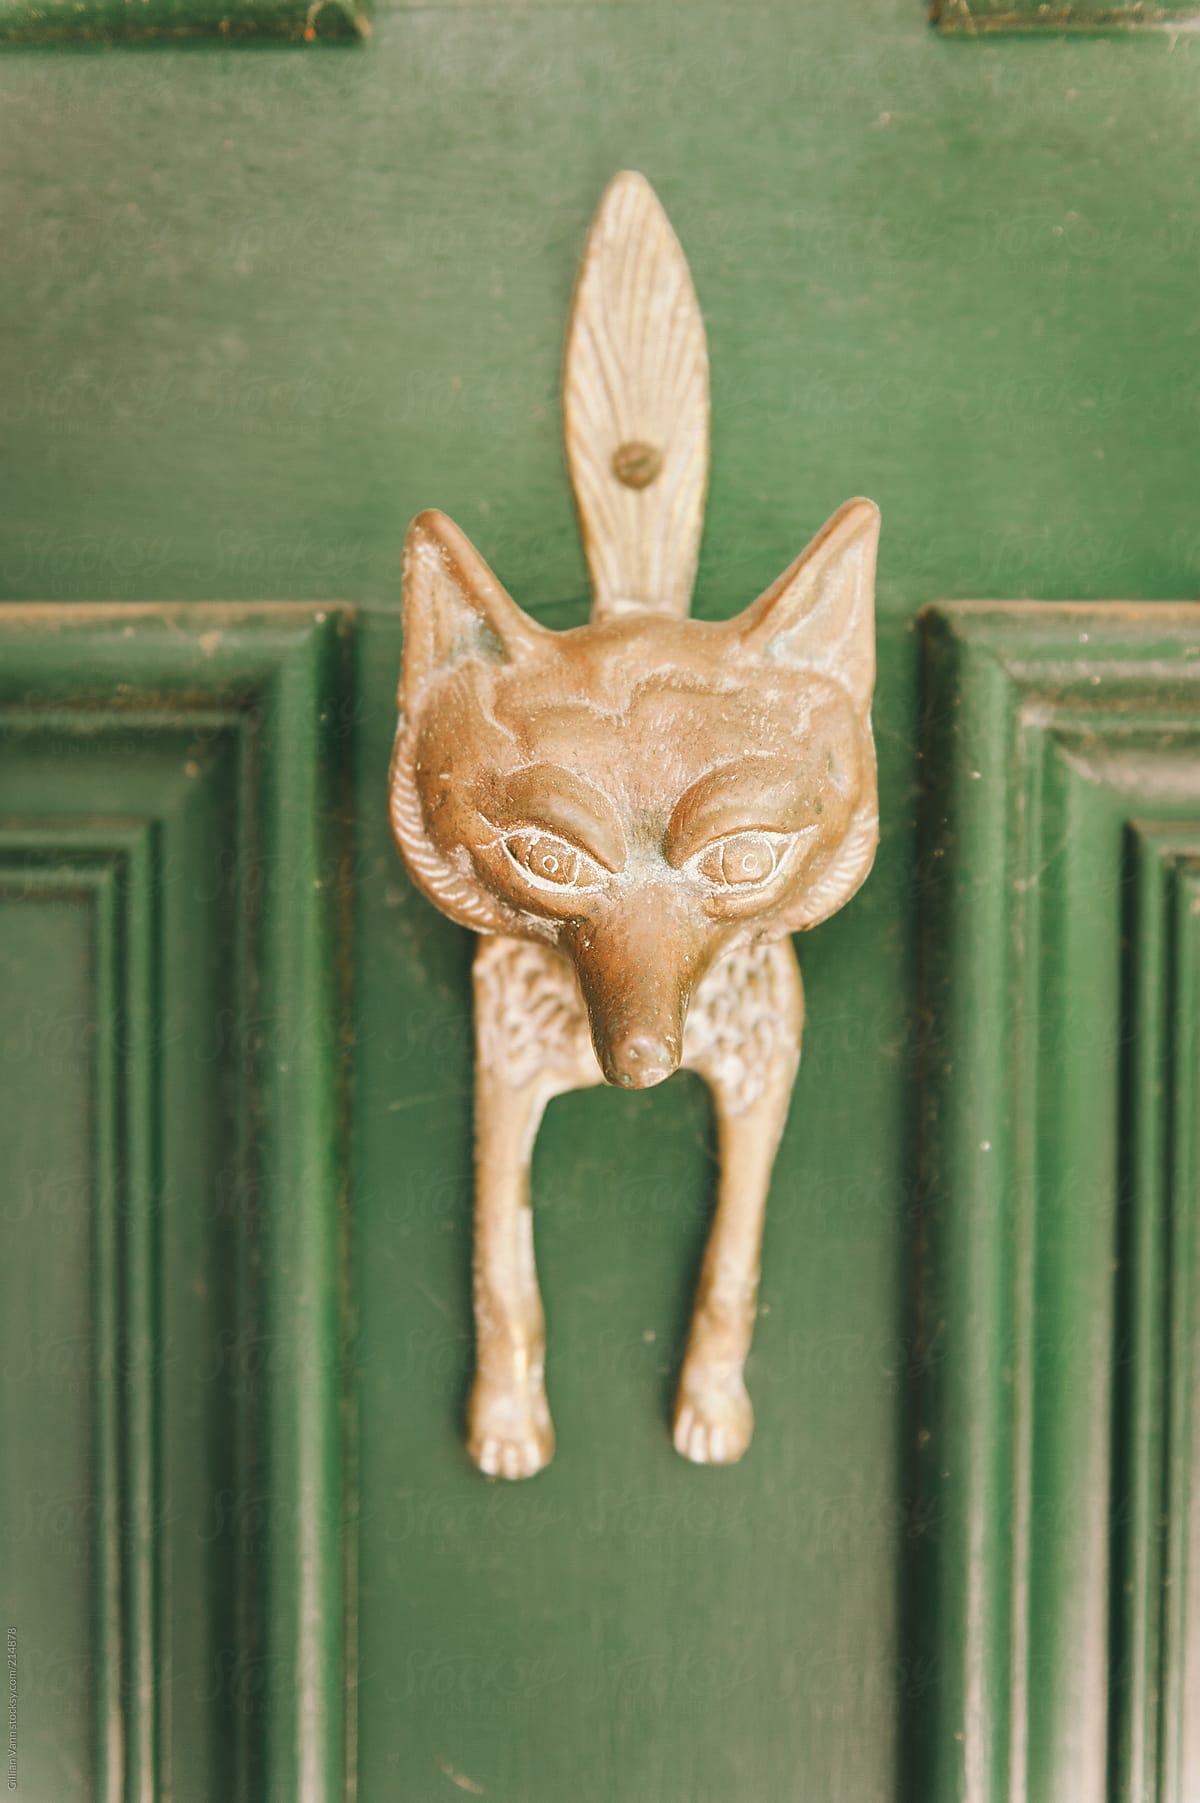 Fox Door Knocker By Gillian Vann For Stocksy United